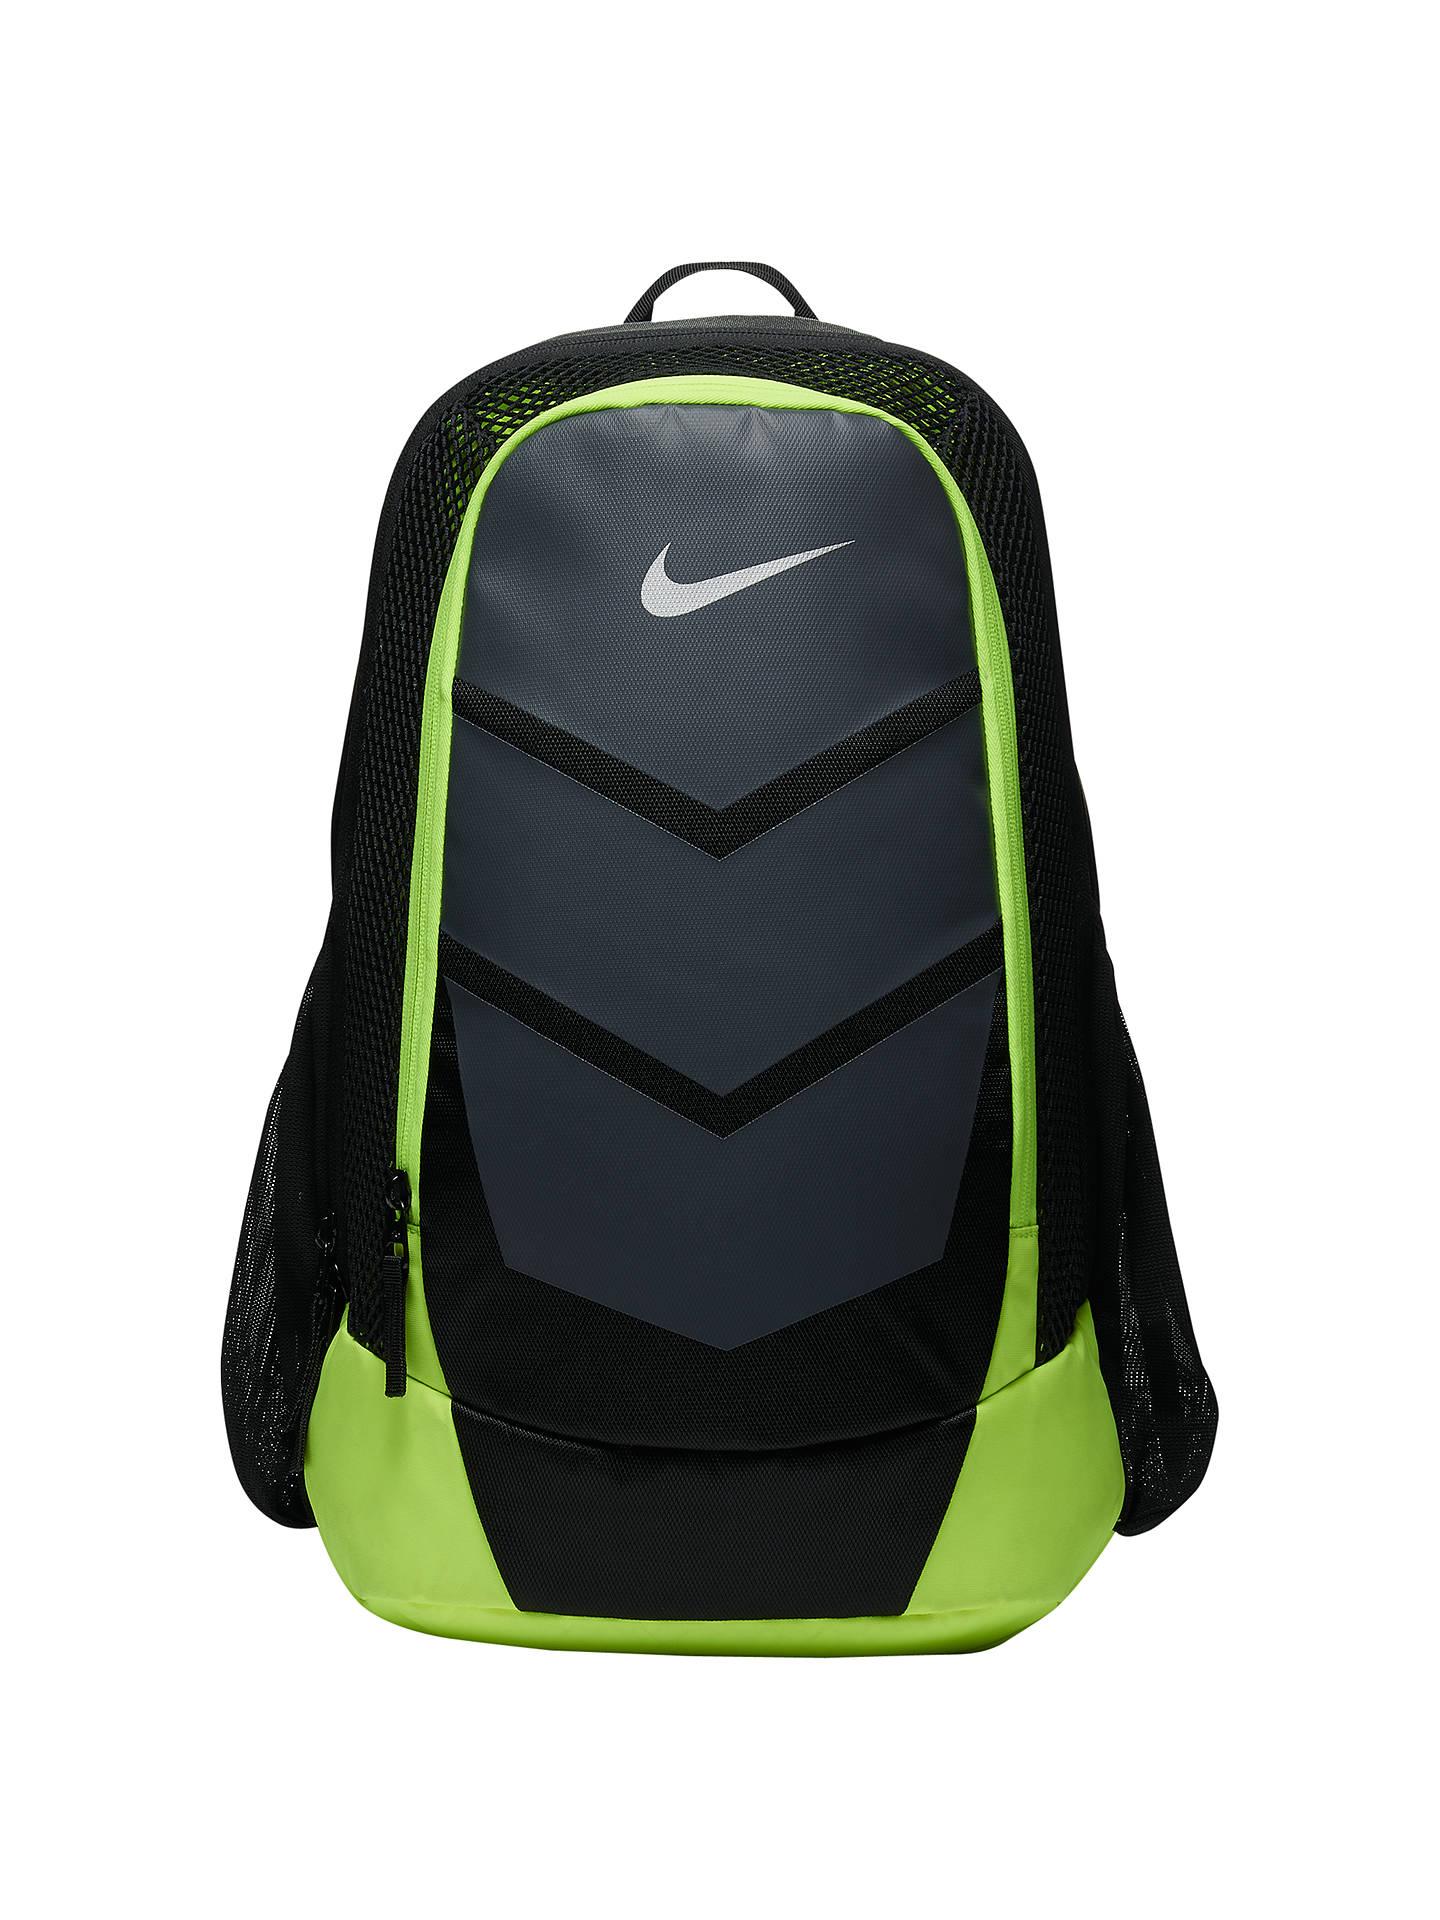 BuyNike Vapor Speed Training Backpack, Black Volt Online at johnlewis.com  ... 9461ae9784